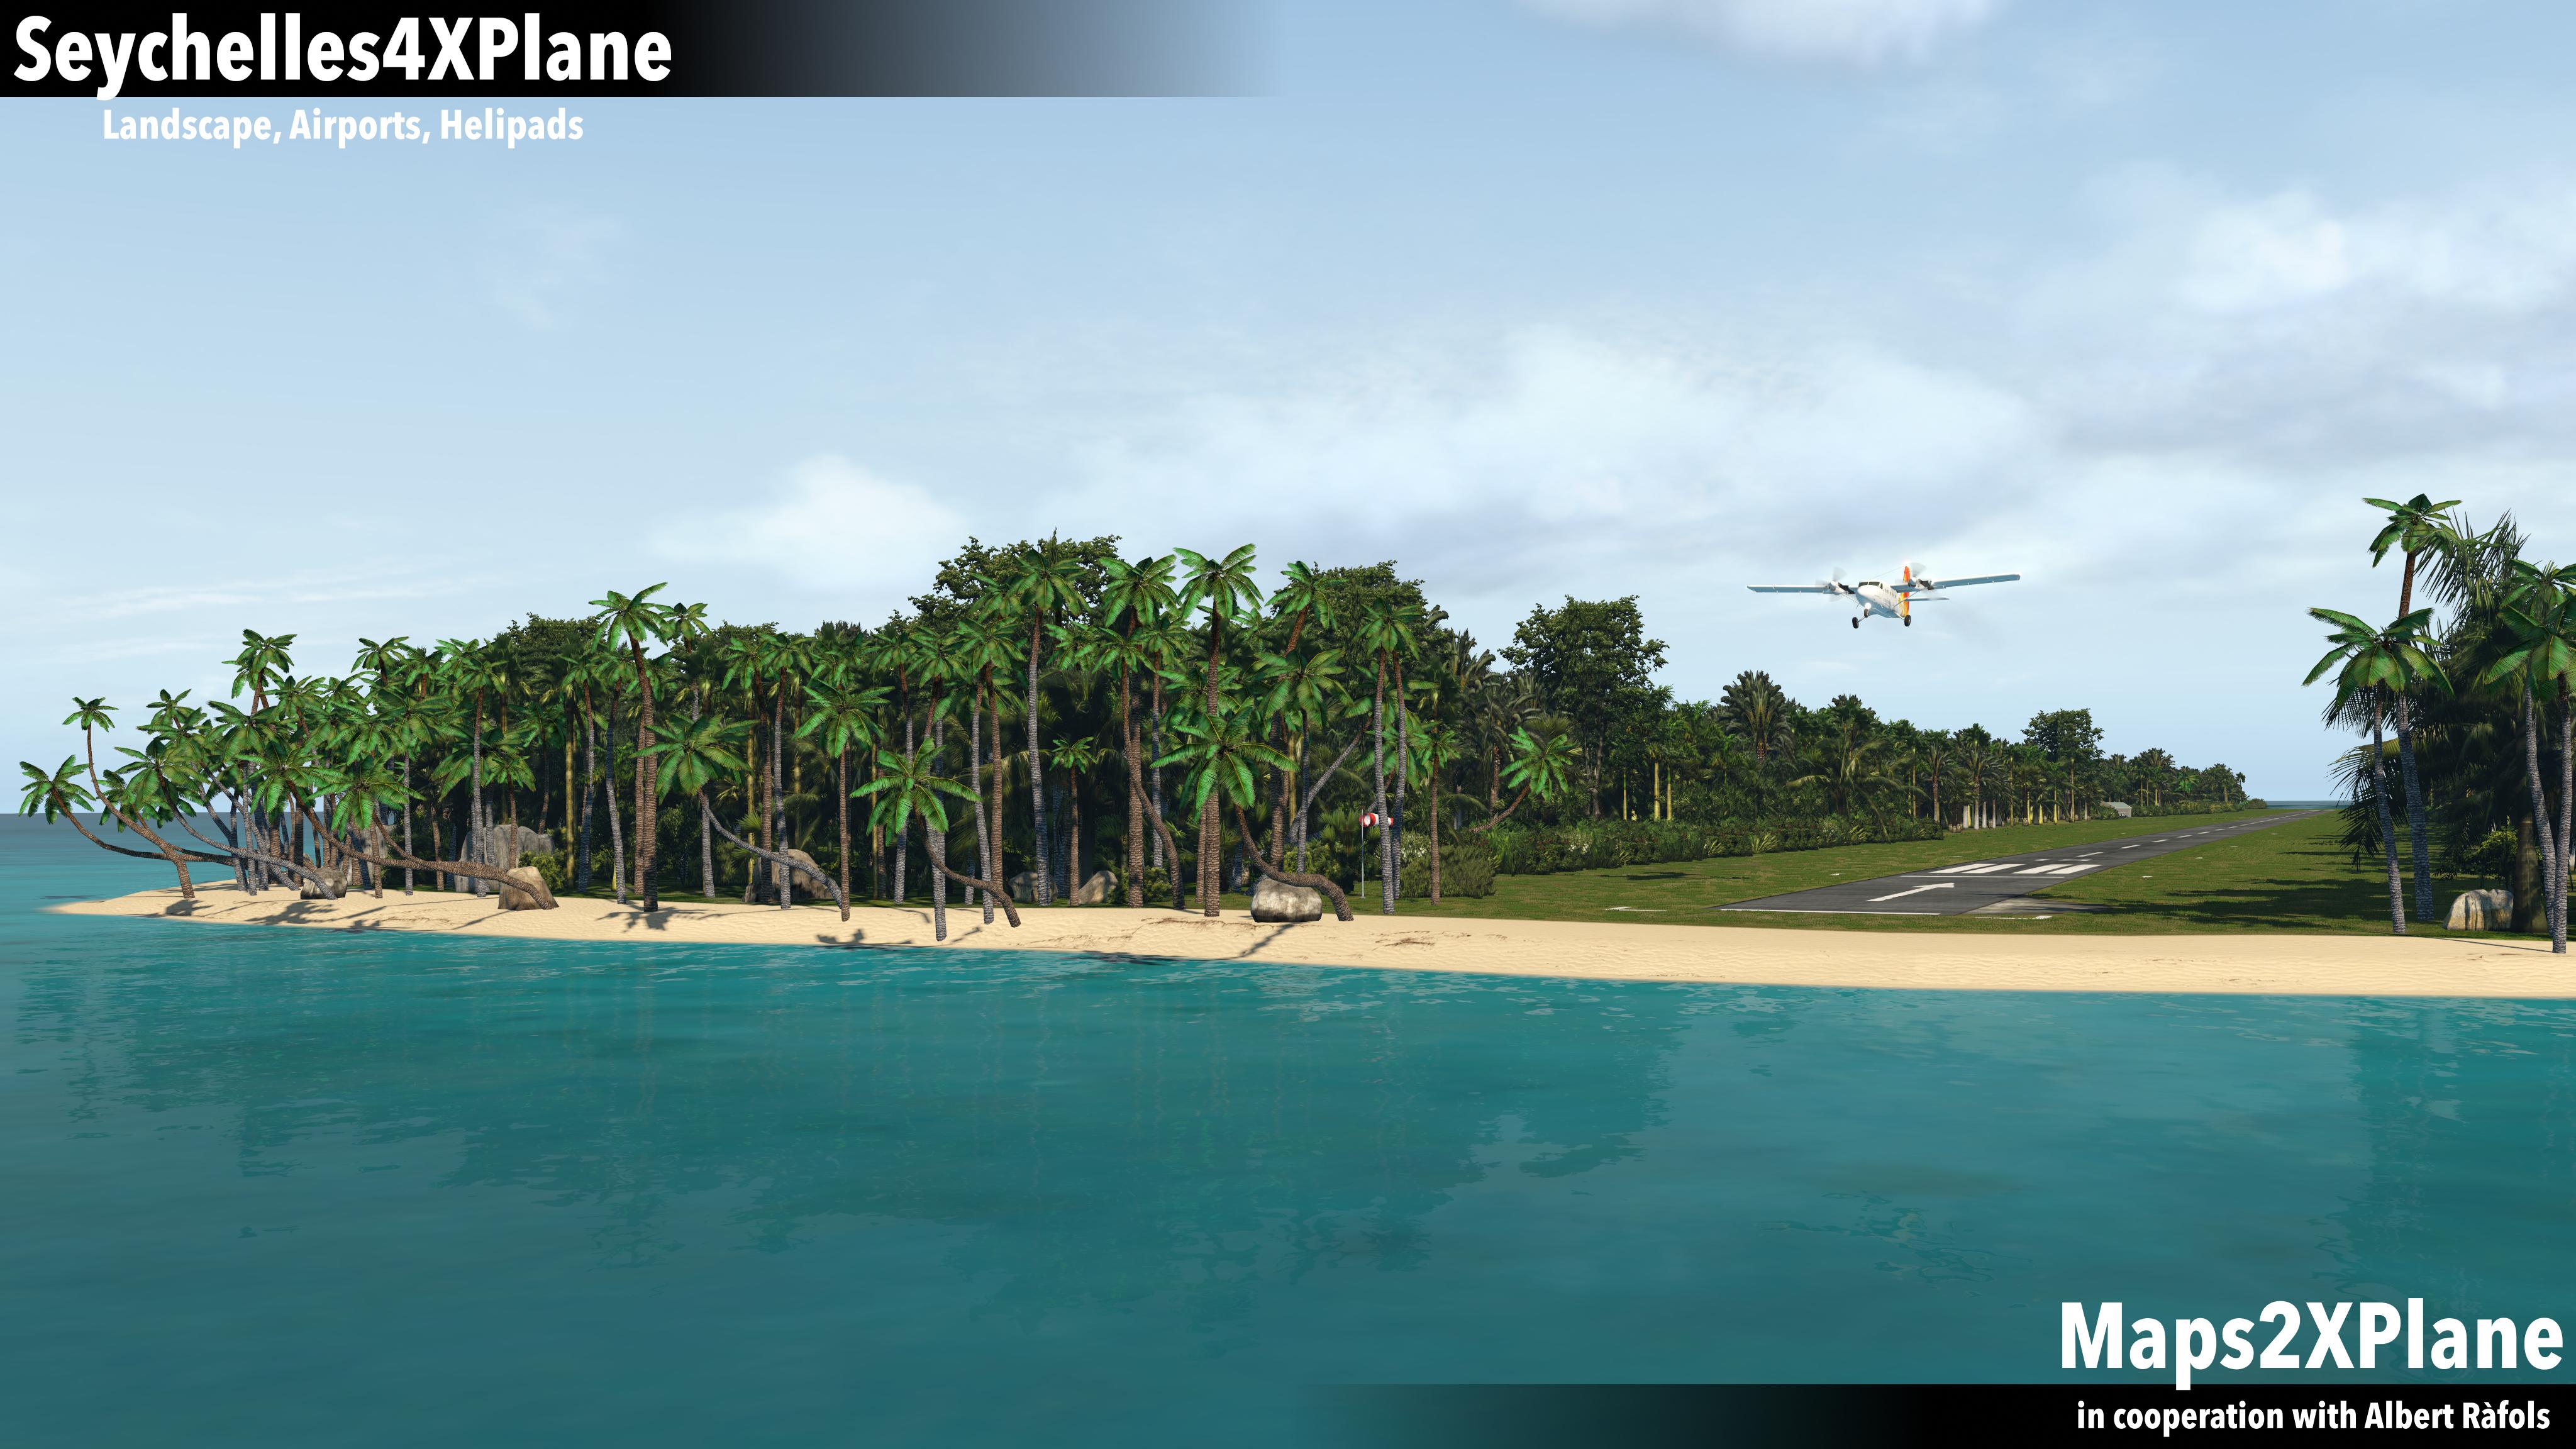 seychelles4xplane_fsal_03.jpg